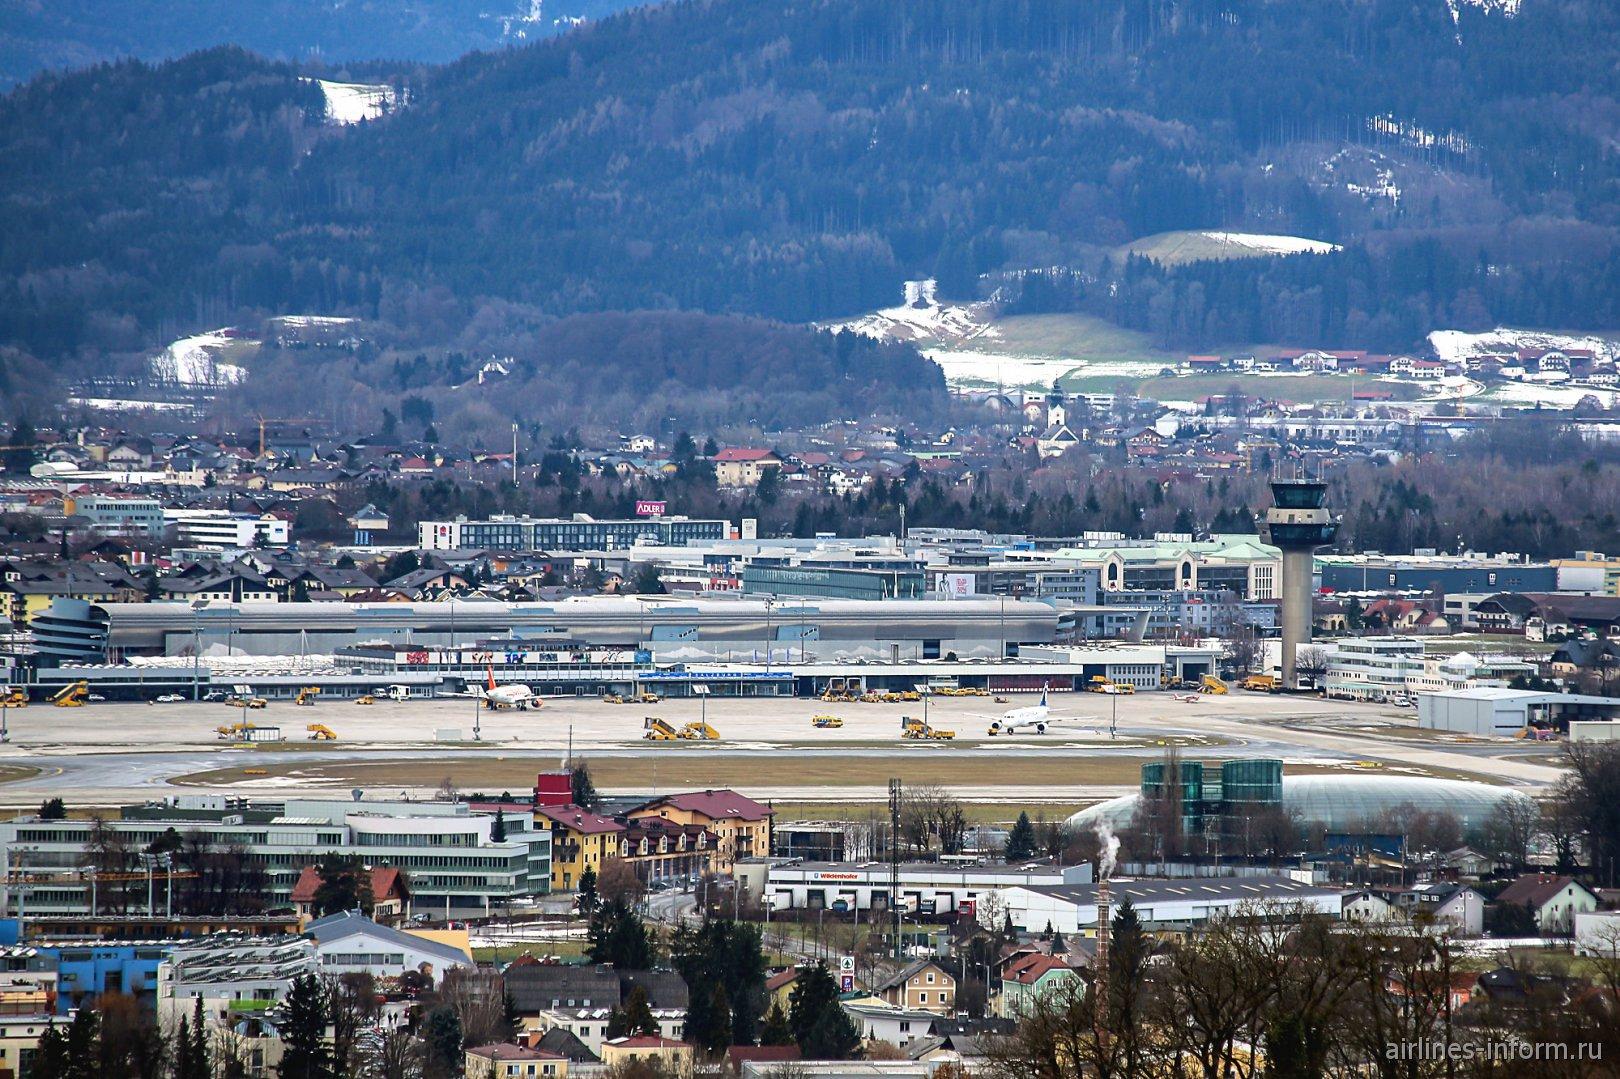 Перрон аэропорта Зальцбург имени Моцарта